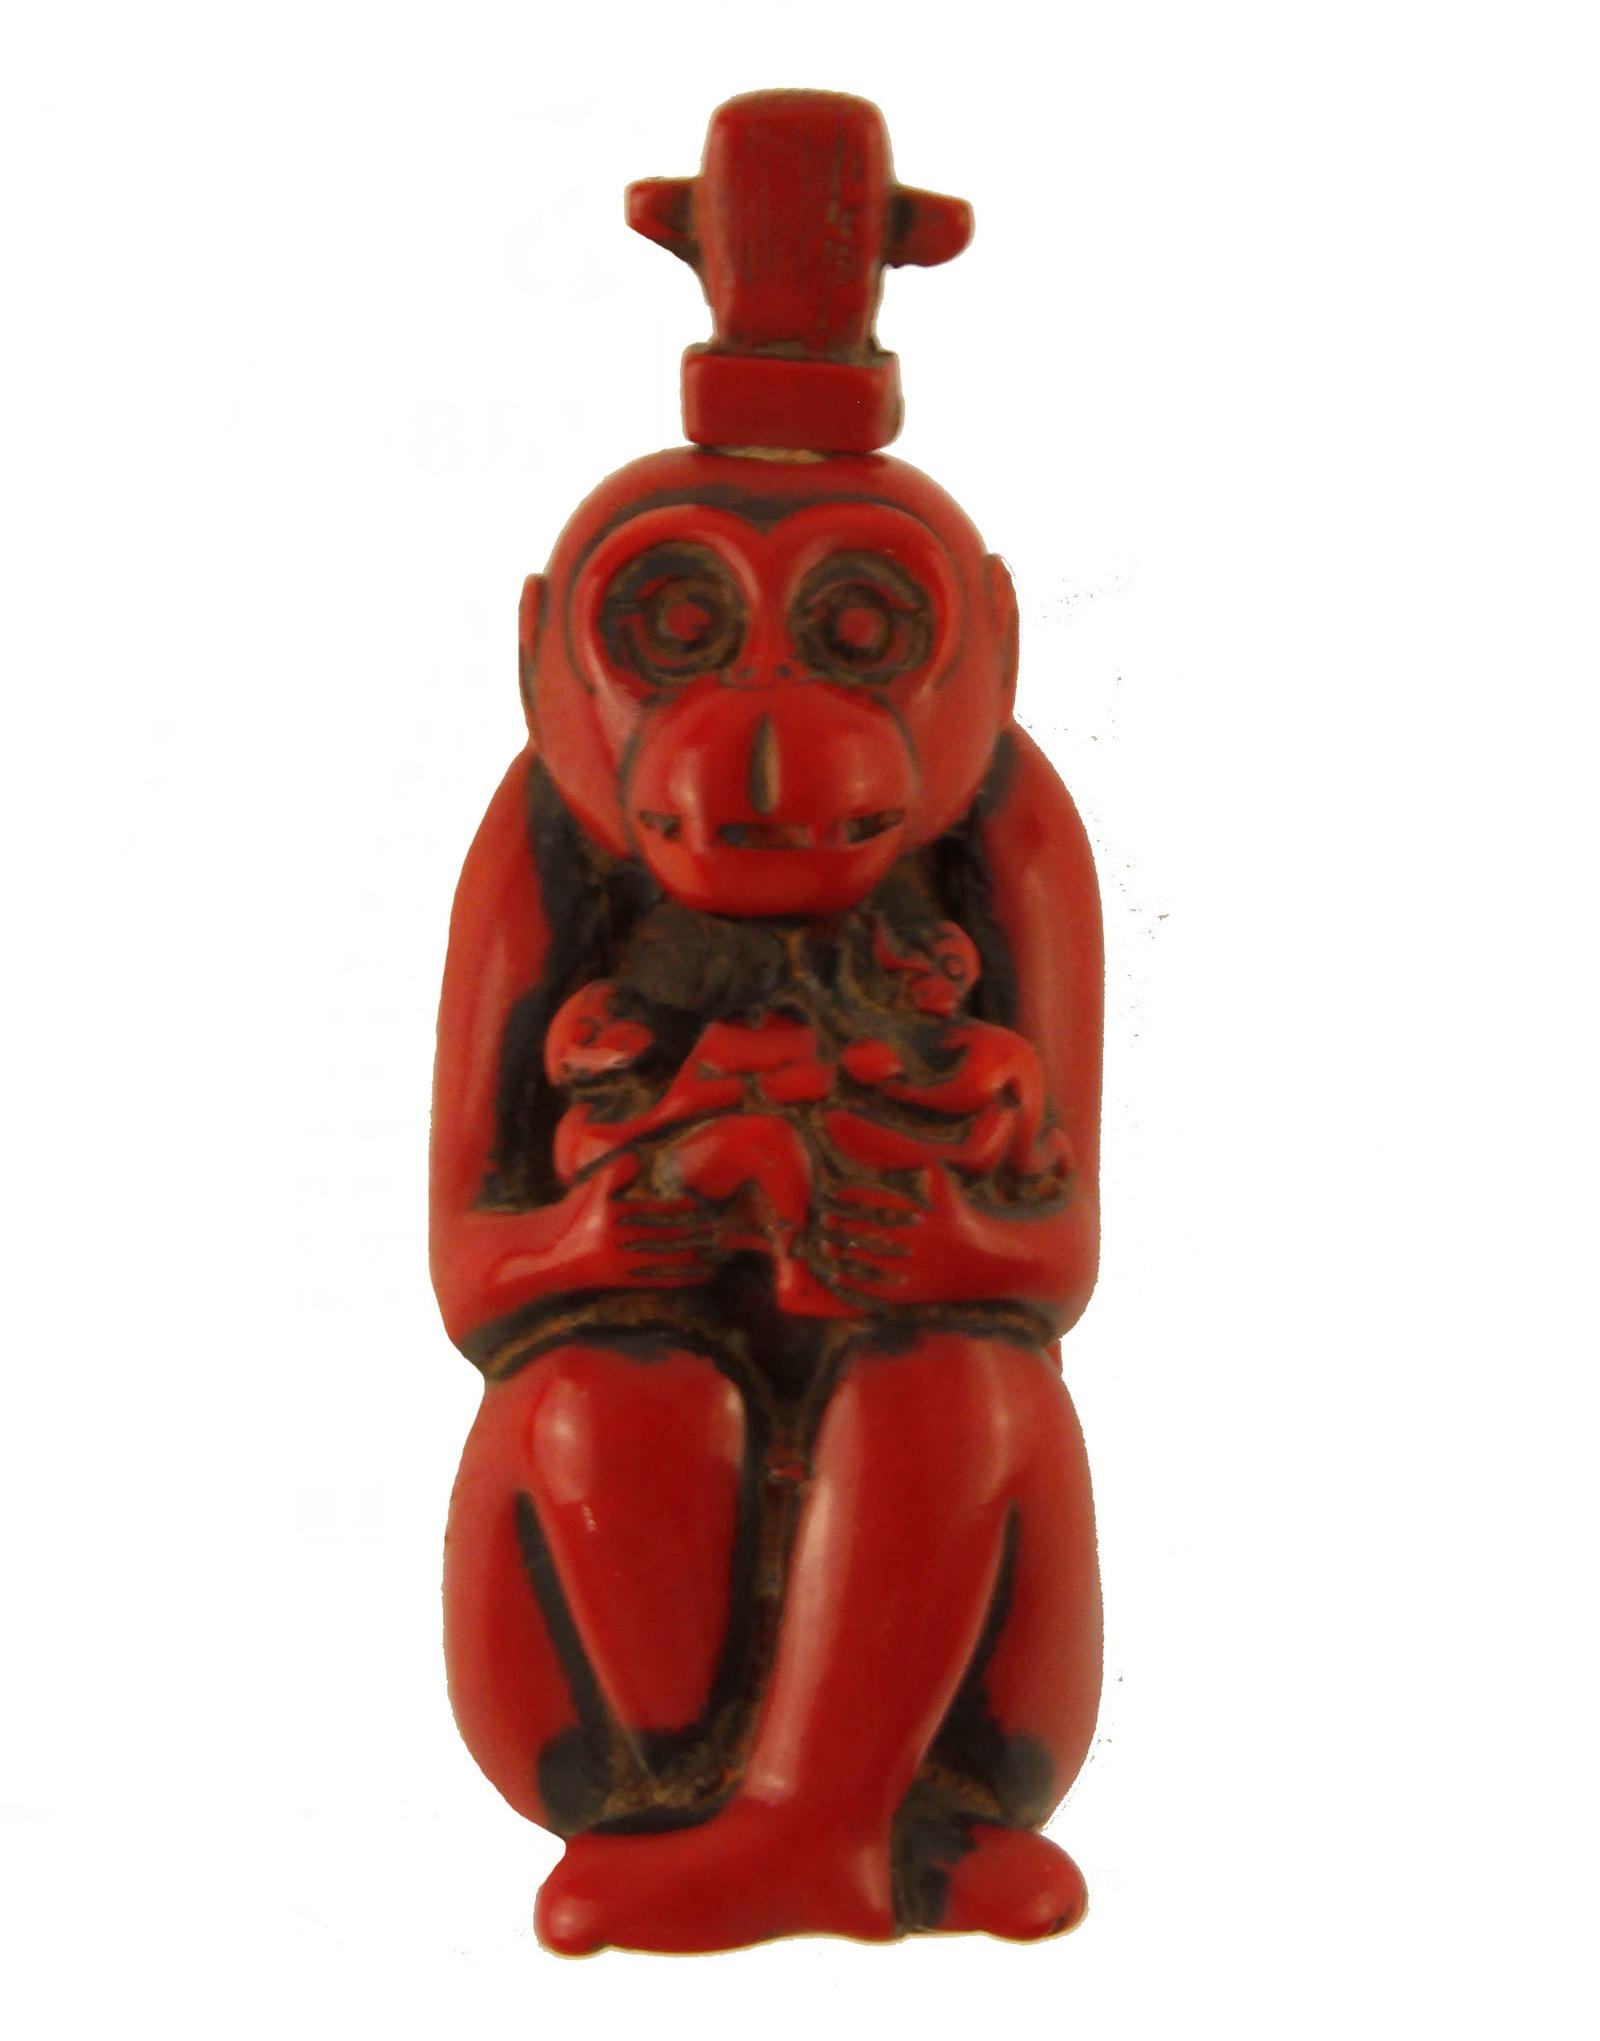 цена Каминный набор Антик Хобби OC36304, бордовый онлайн в 2017 году